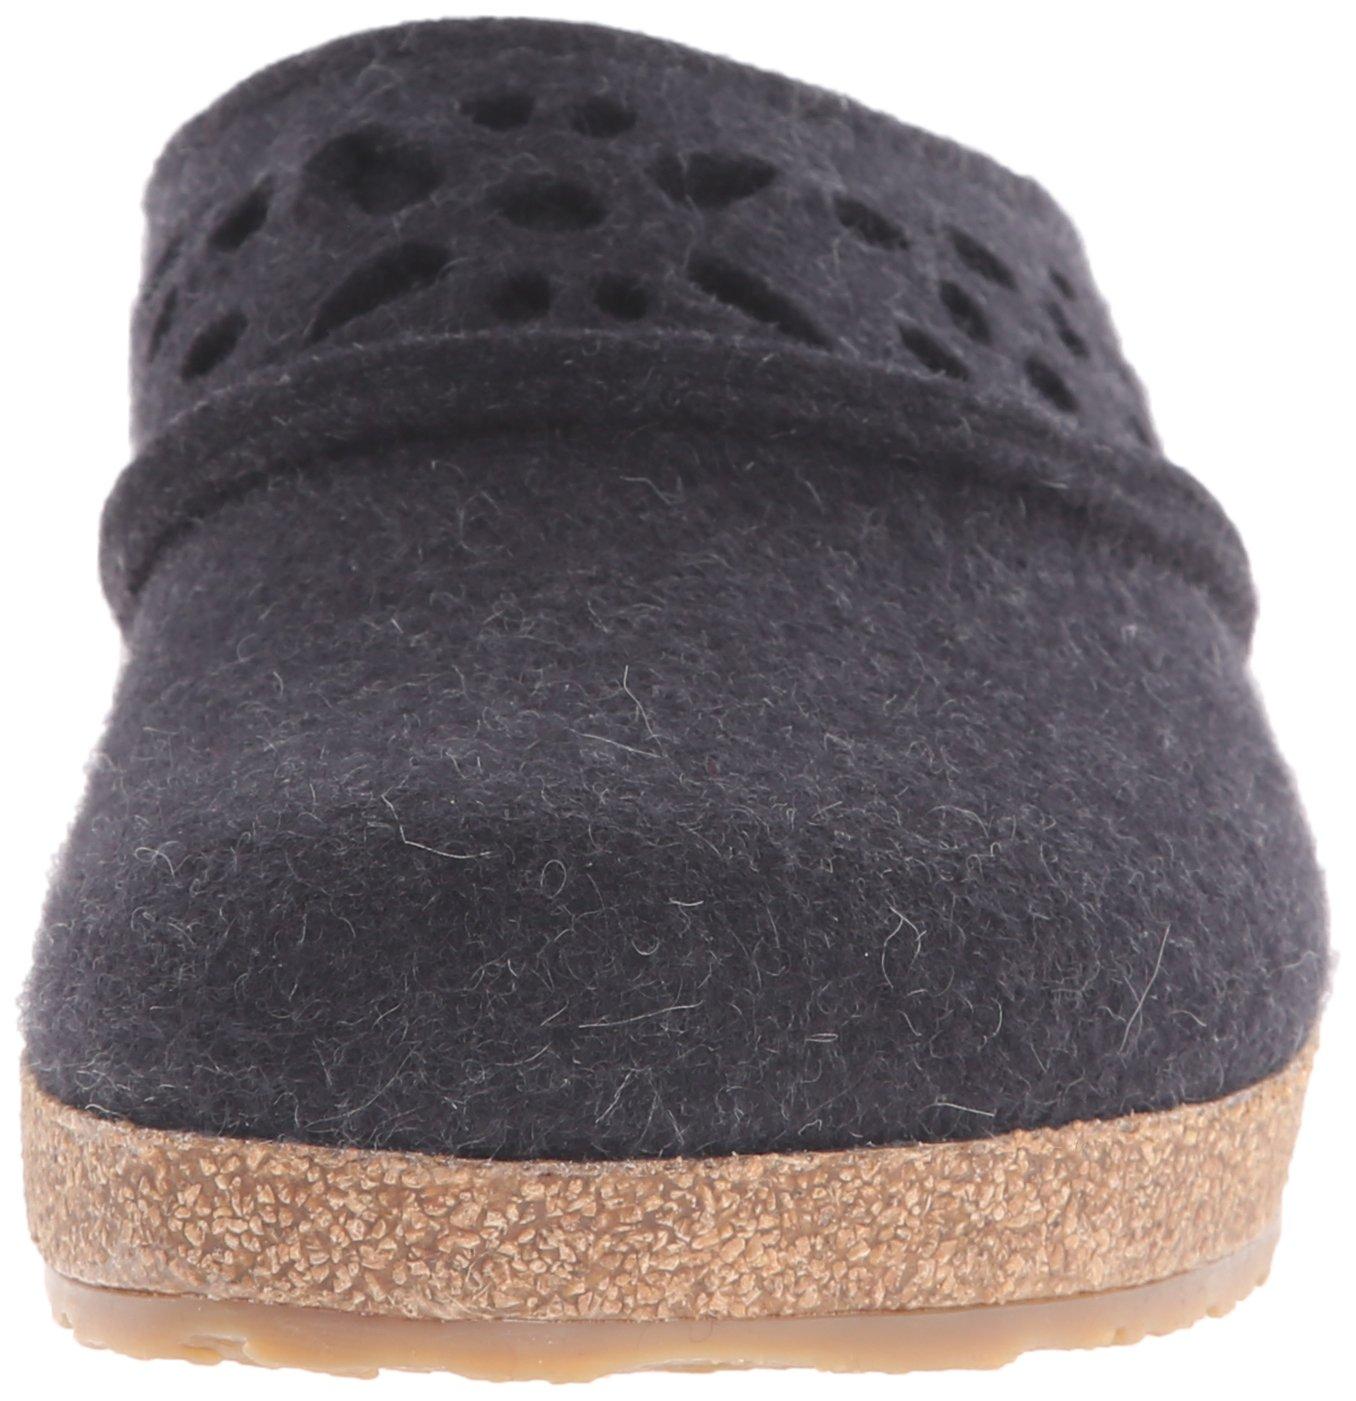 Haflinger Women's Lacey Clog B00U1TMIVE 38 M EU / 7 B(M) US|Charcoal